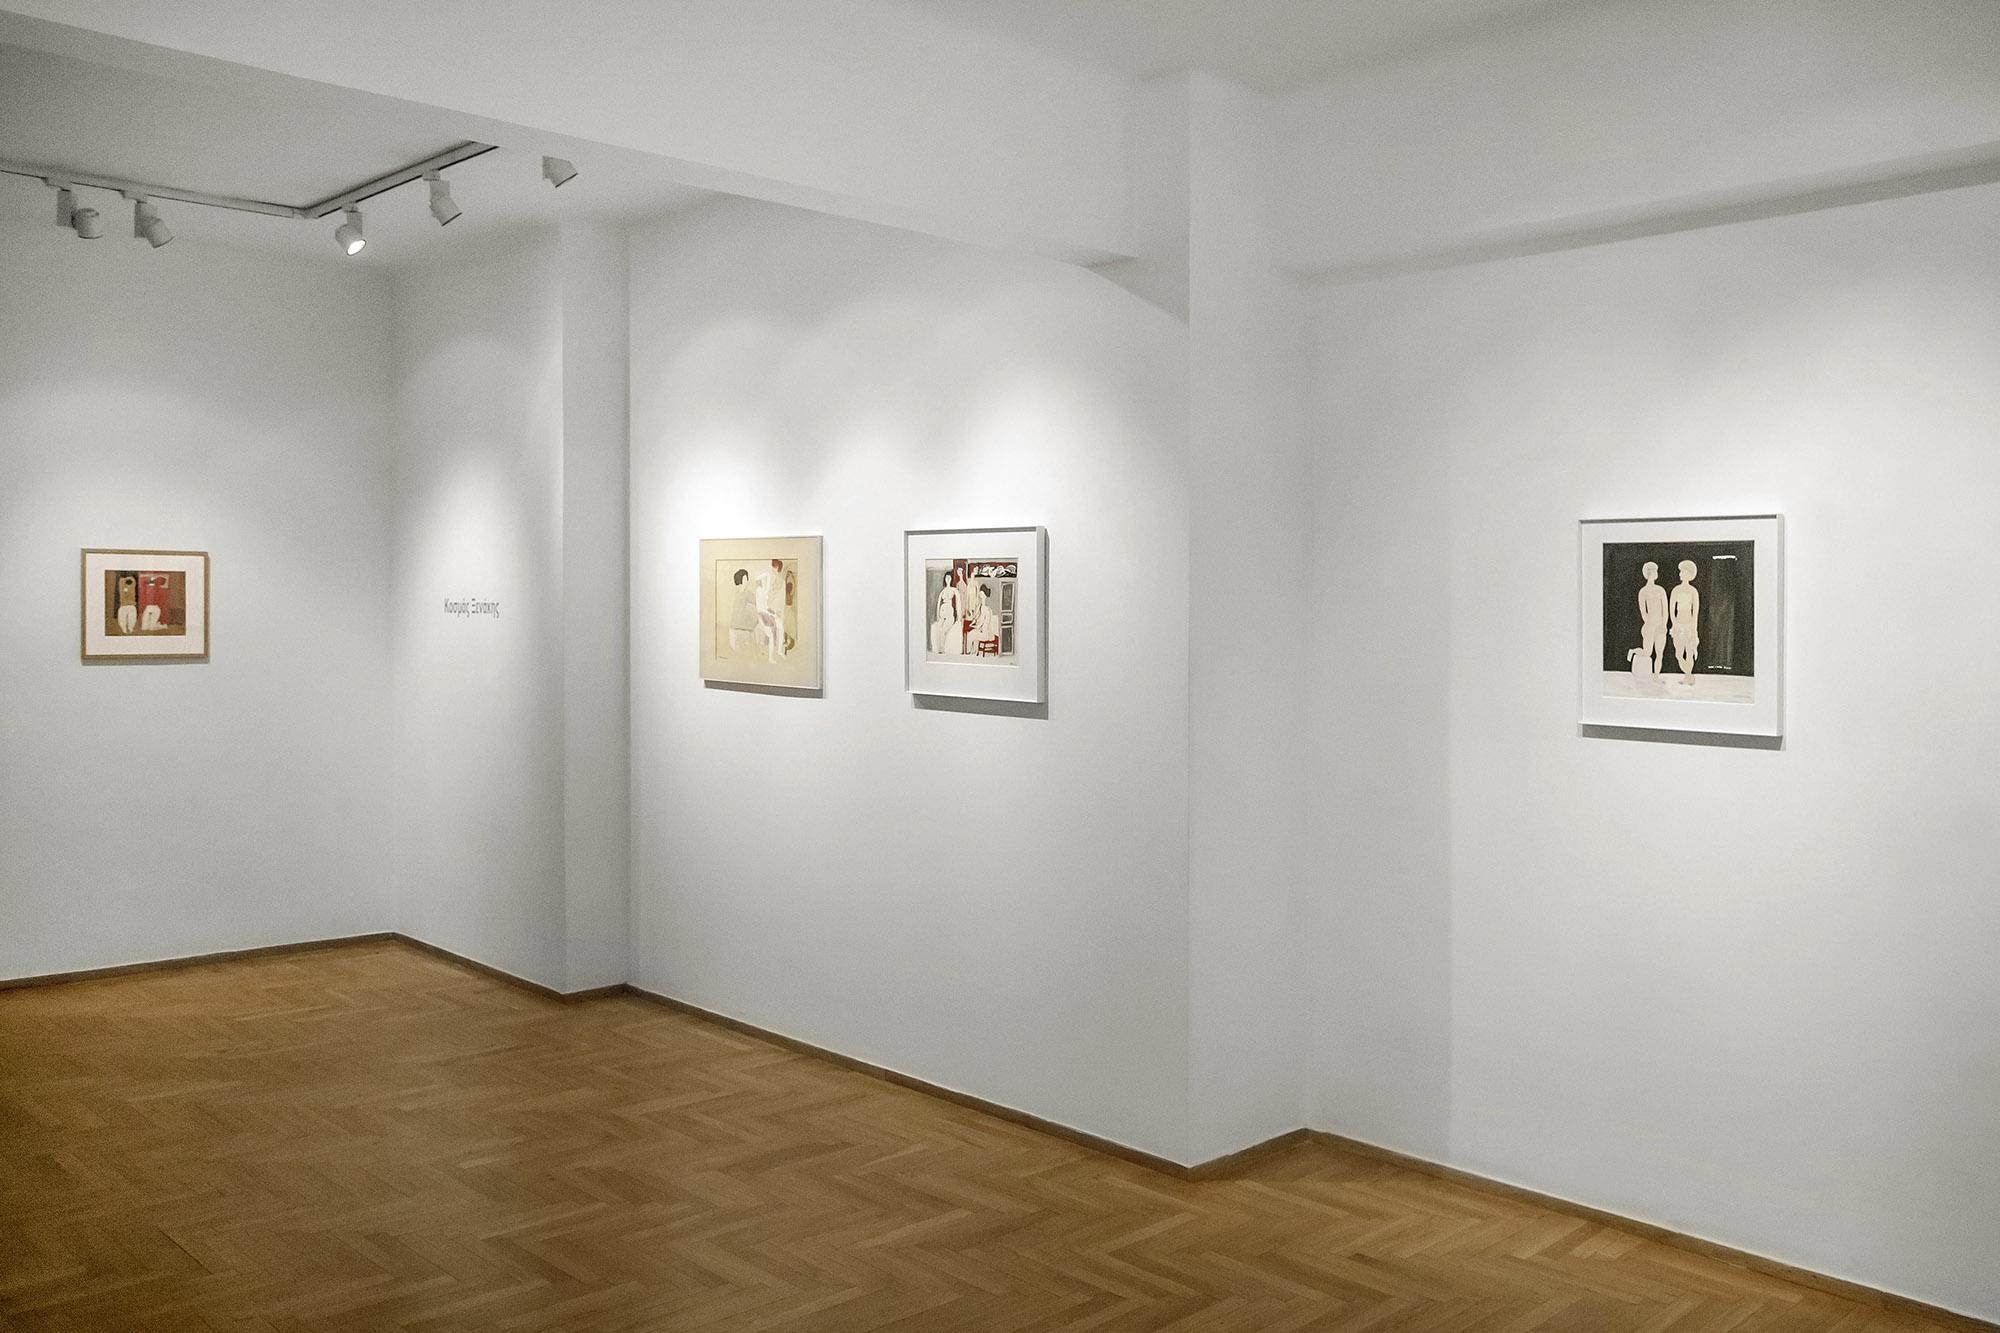 Cosmas Xenakis / The Girls - Image 2